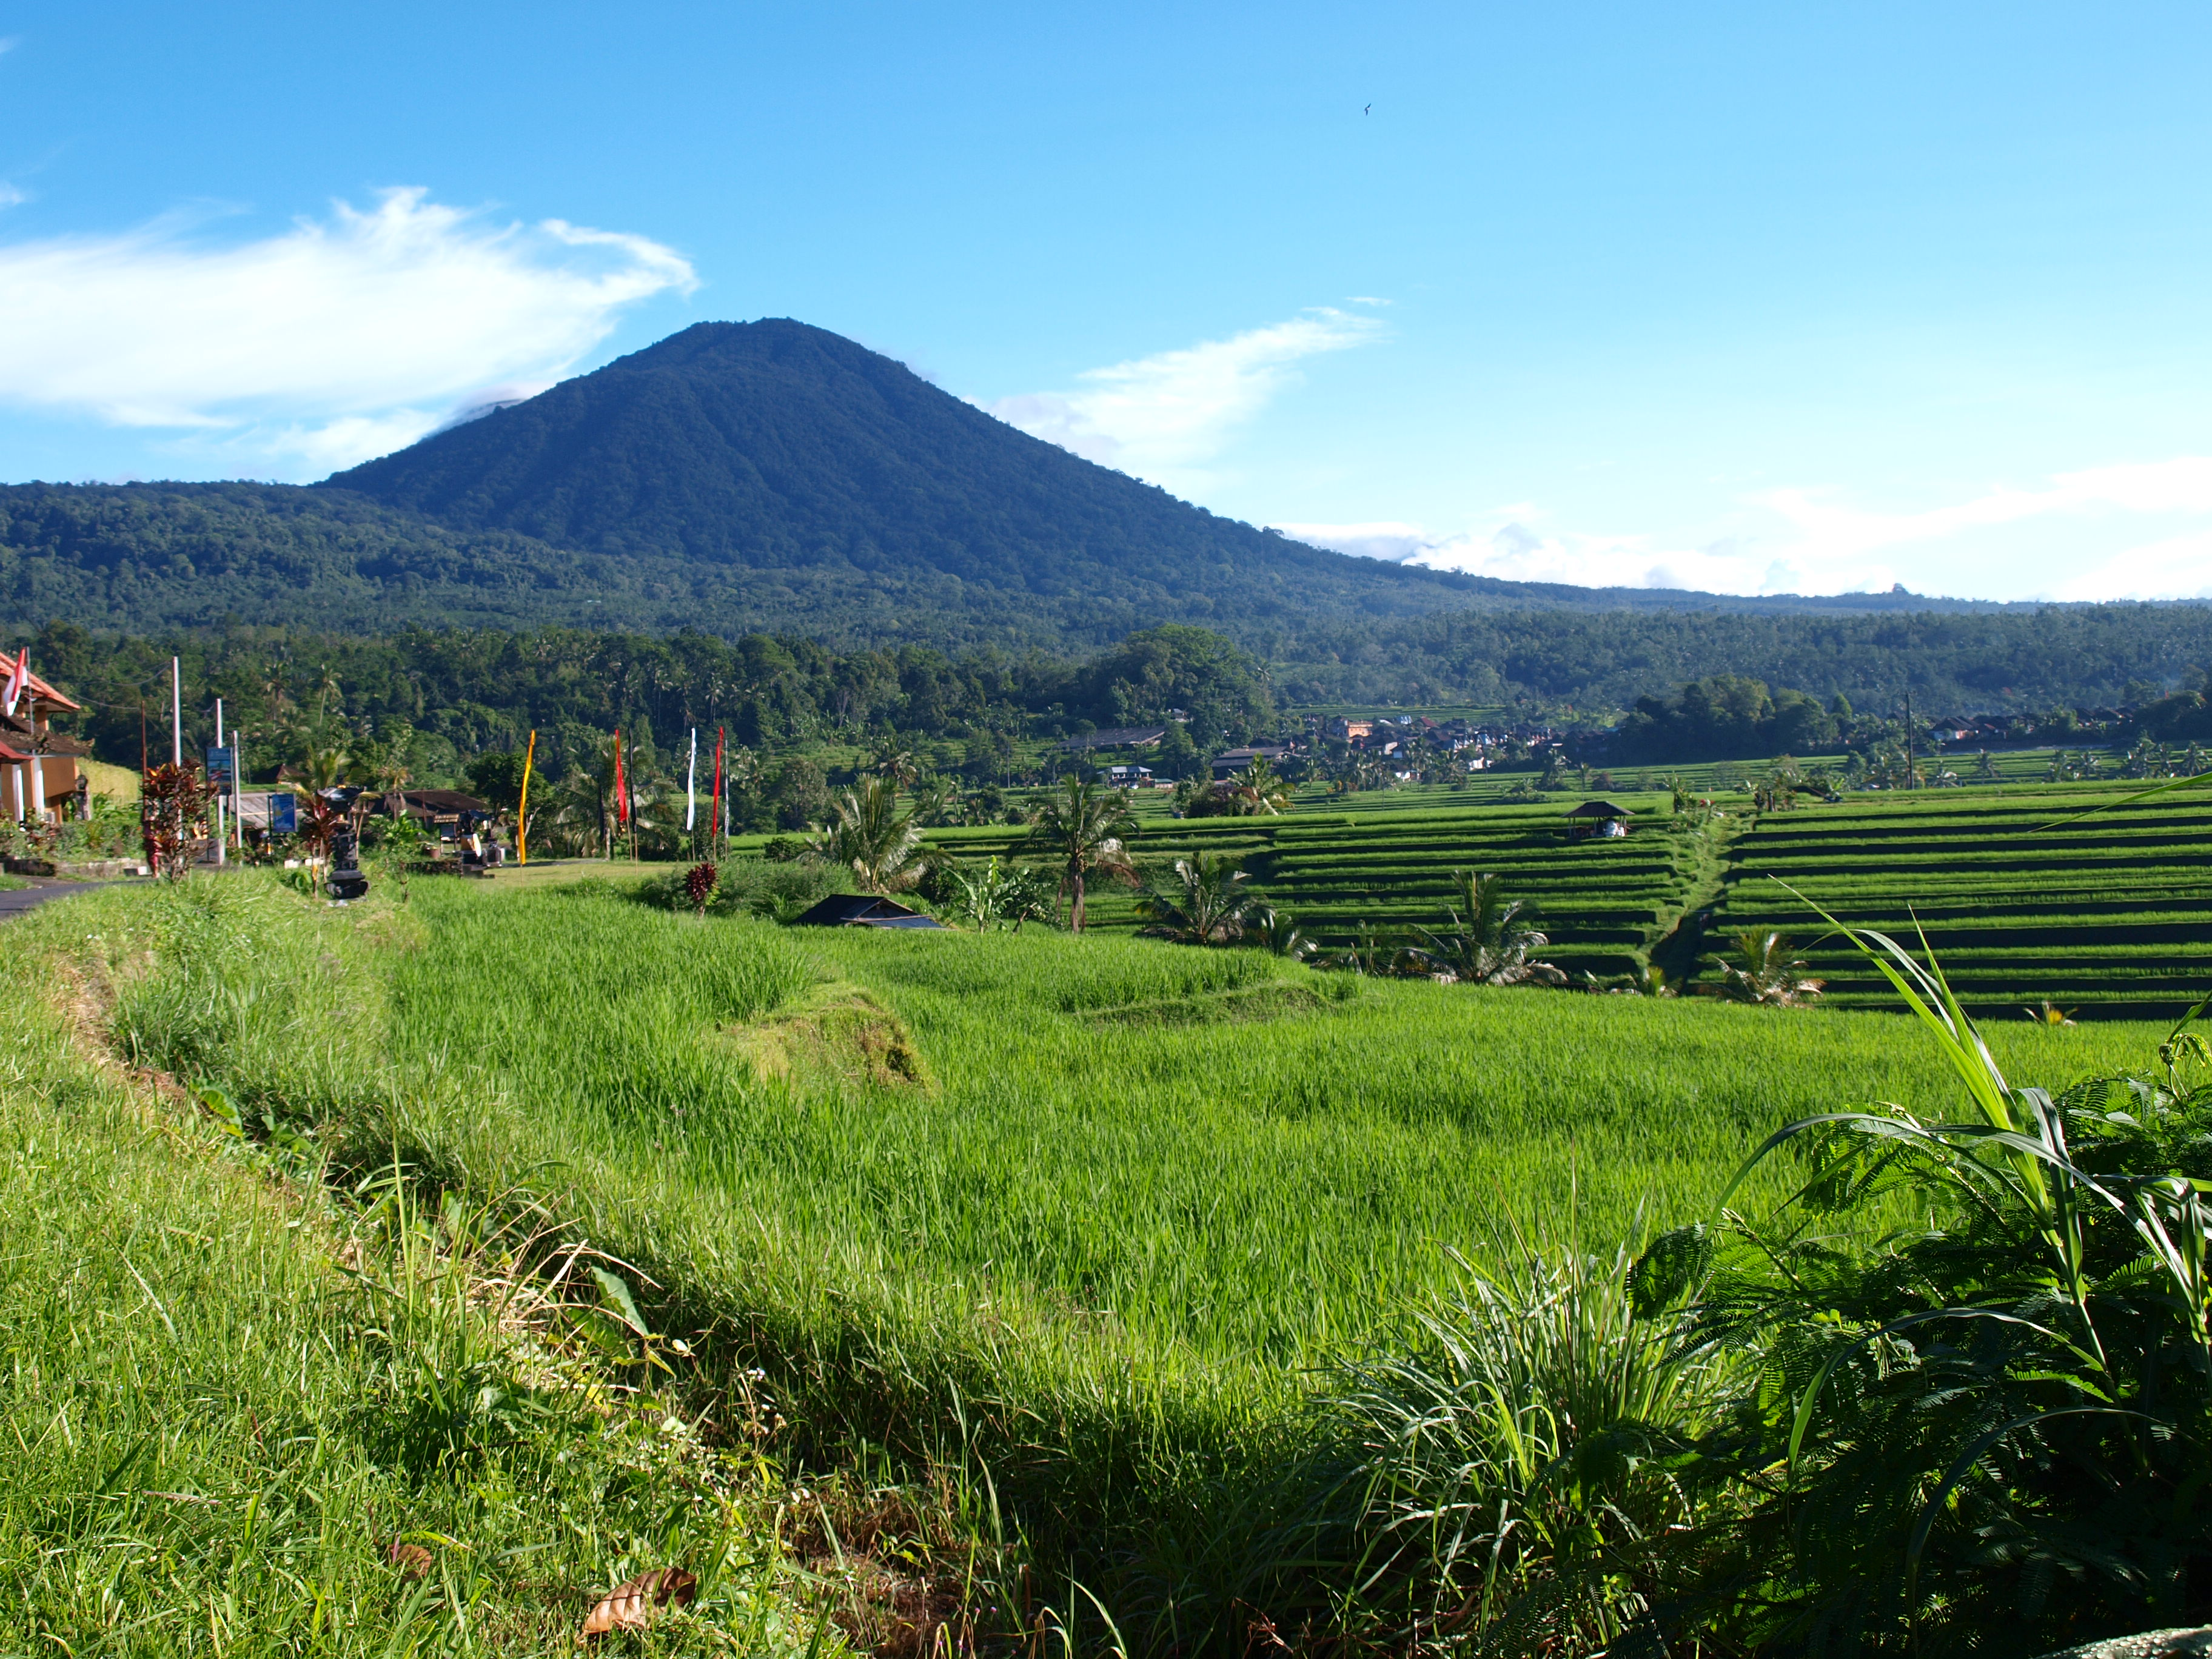 53982736c6f1cbali-scenes-ricefields-02-24-14-147 0 - climate adaptation.